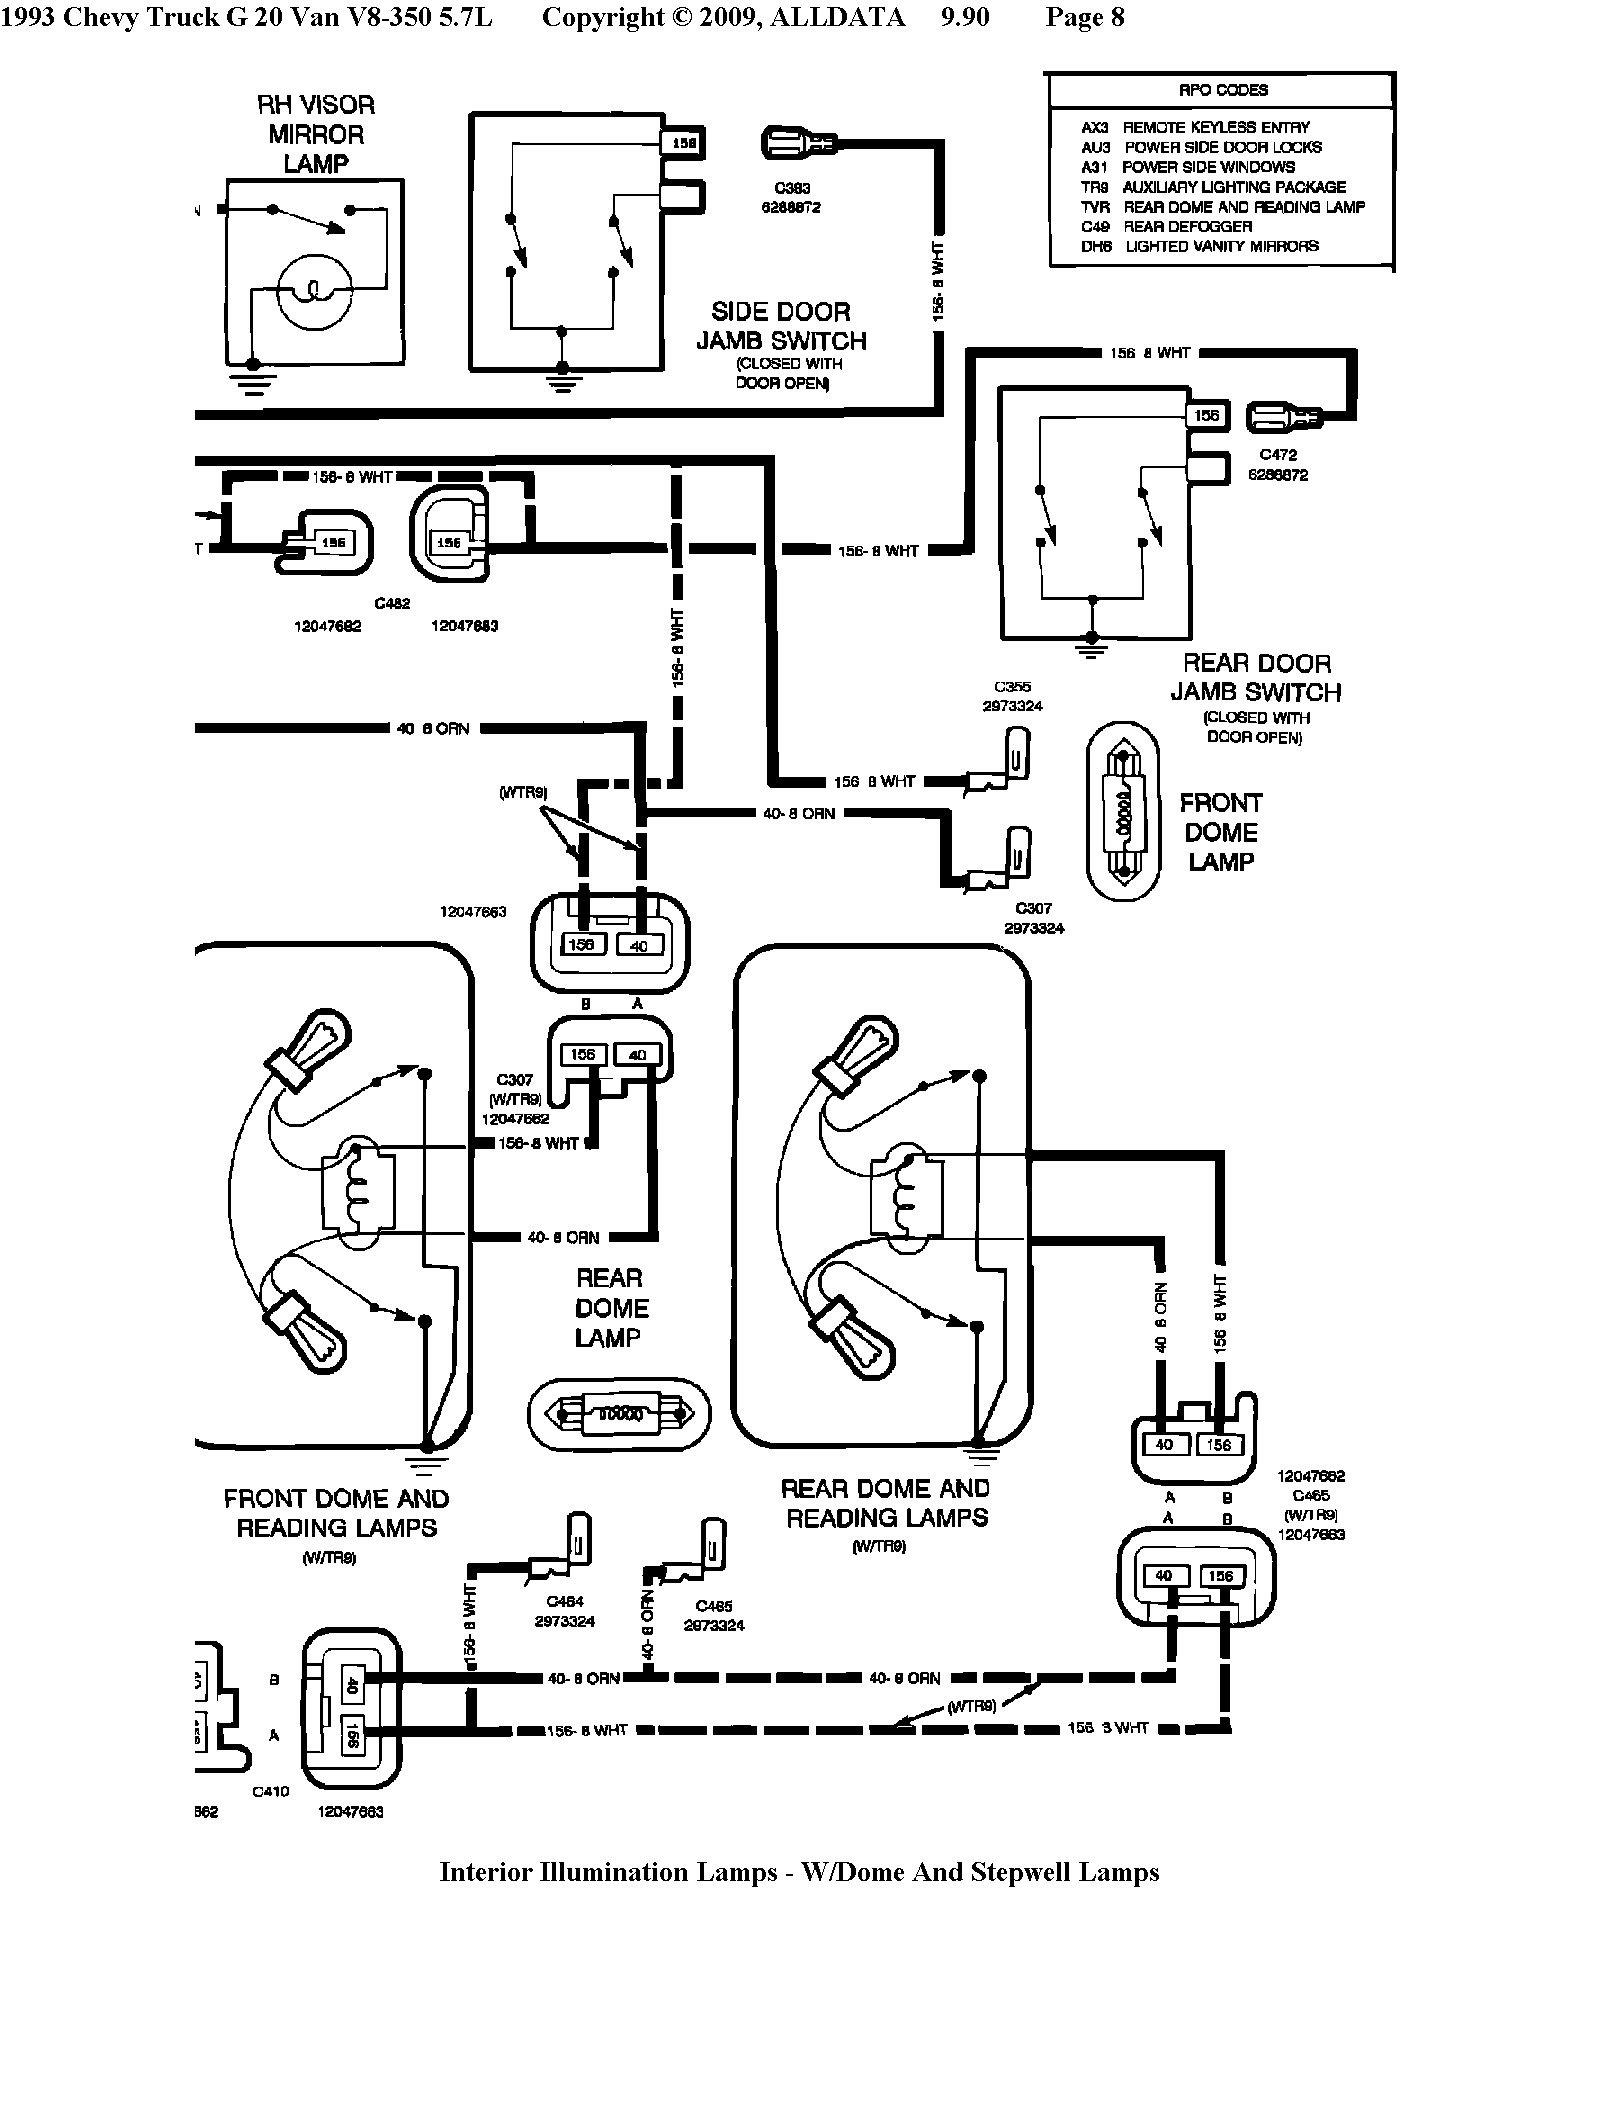 chevy g20 conversion van 5 0l engine chime  buzzer not